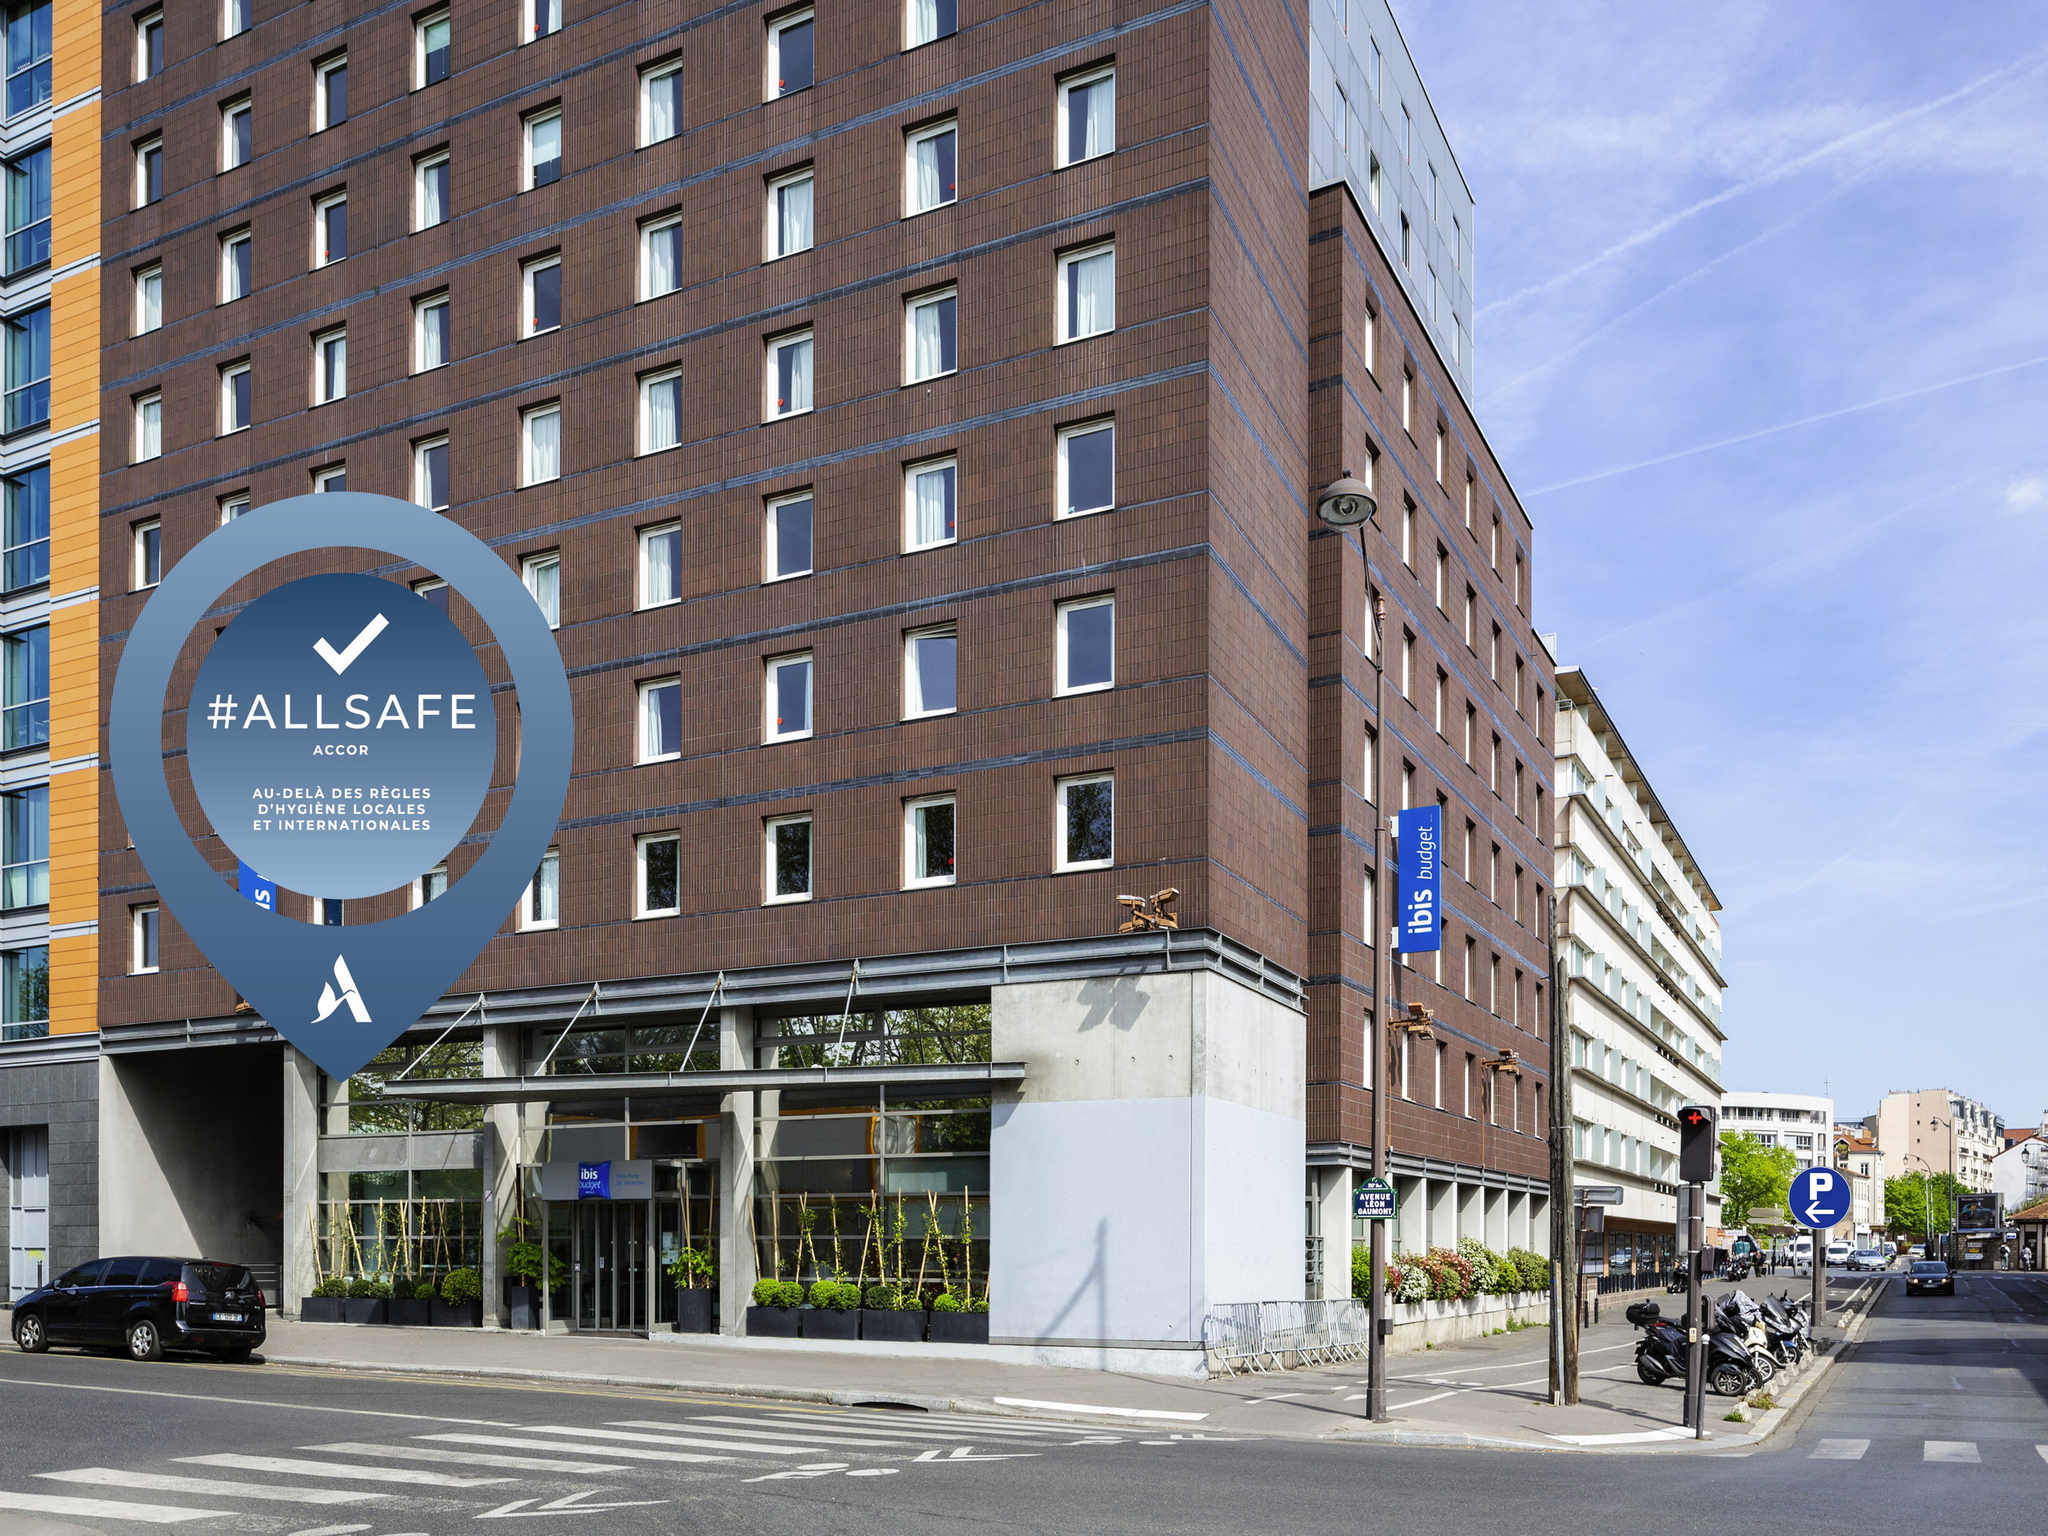 فندق - إيبيس بدجت ibis budget باريس بورت دو فنسان